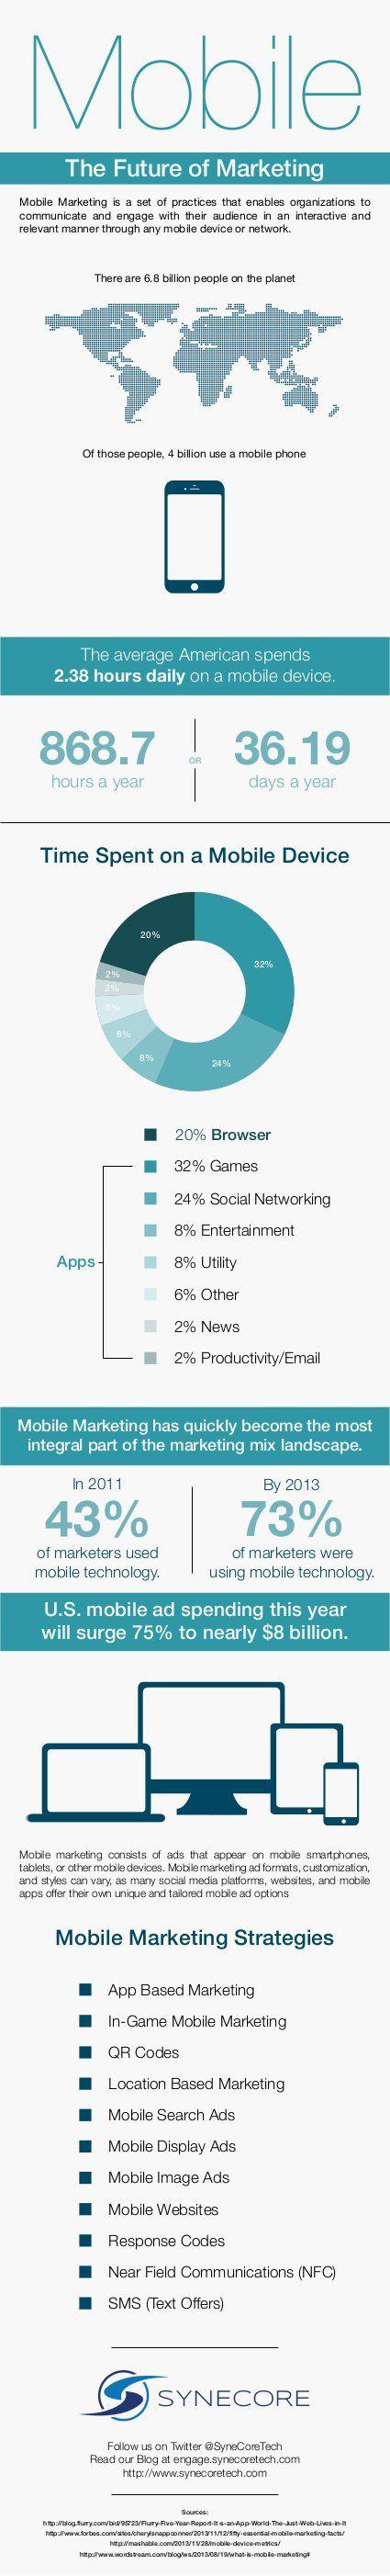 #Mobile The Future of #Marketing